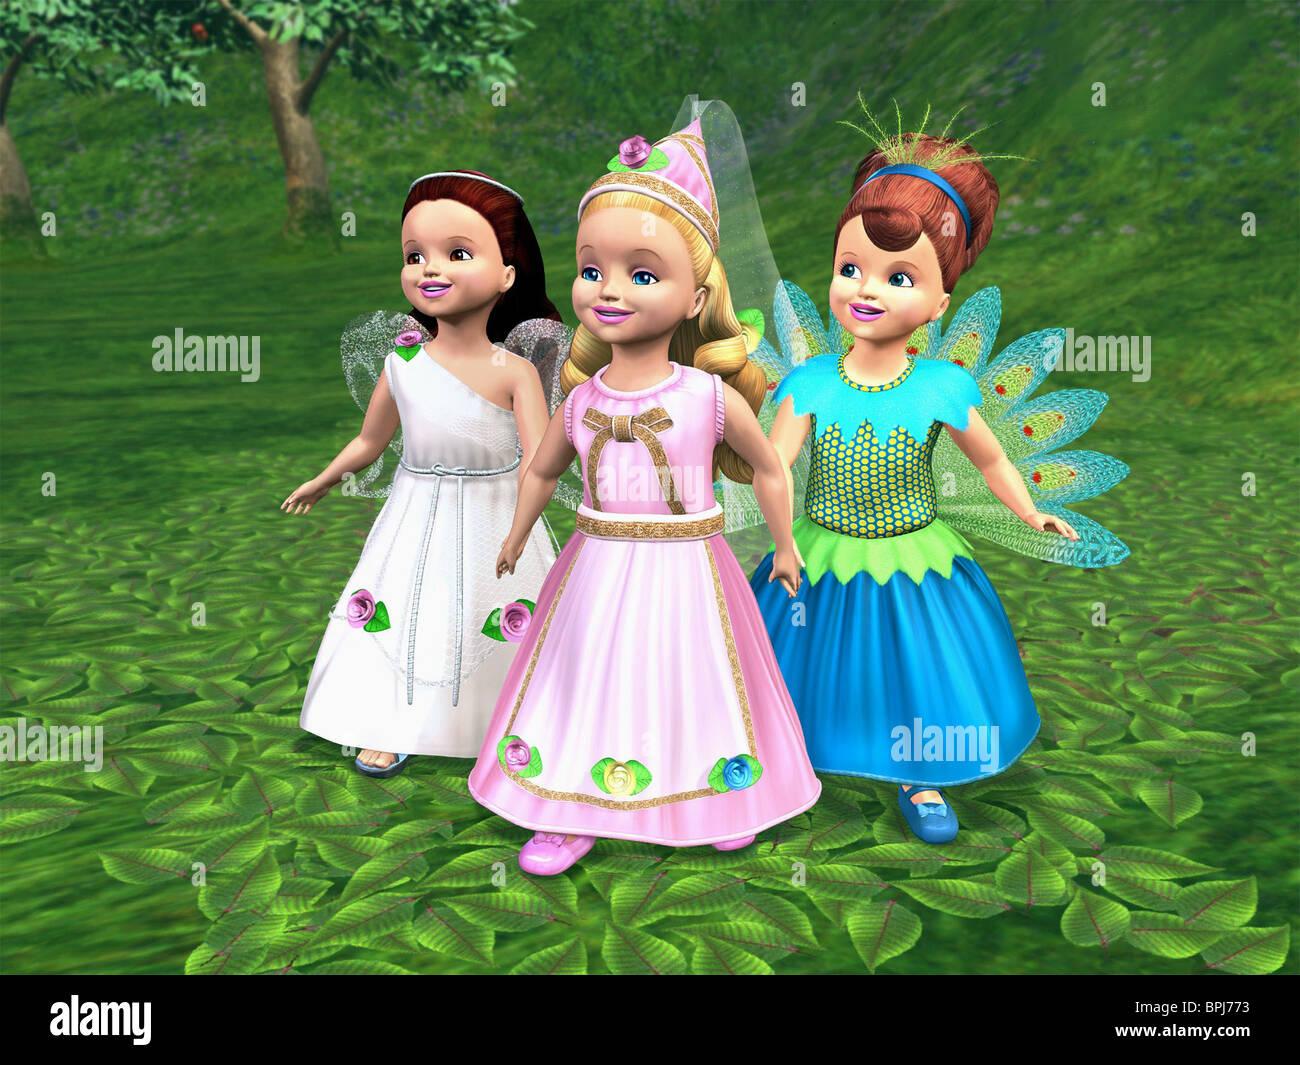 Feen Barbie Als Rapunzel 2002 Stockfoto Bild 31133623 Alamy